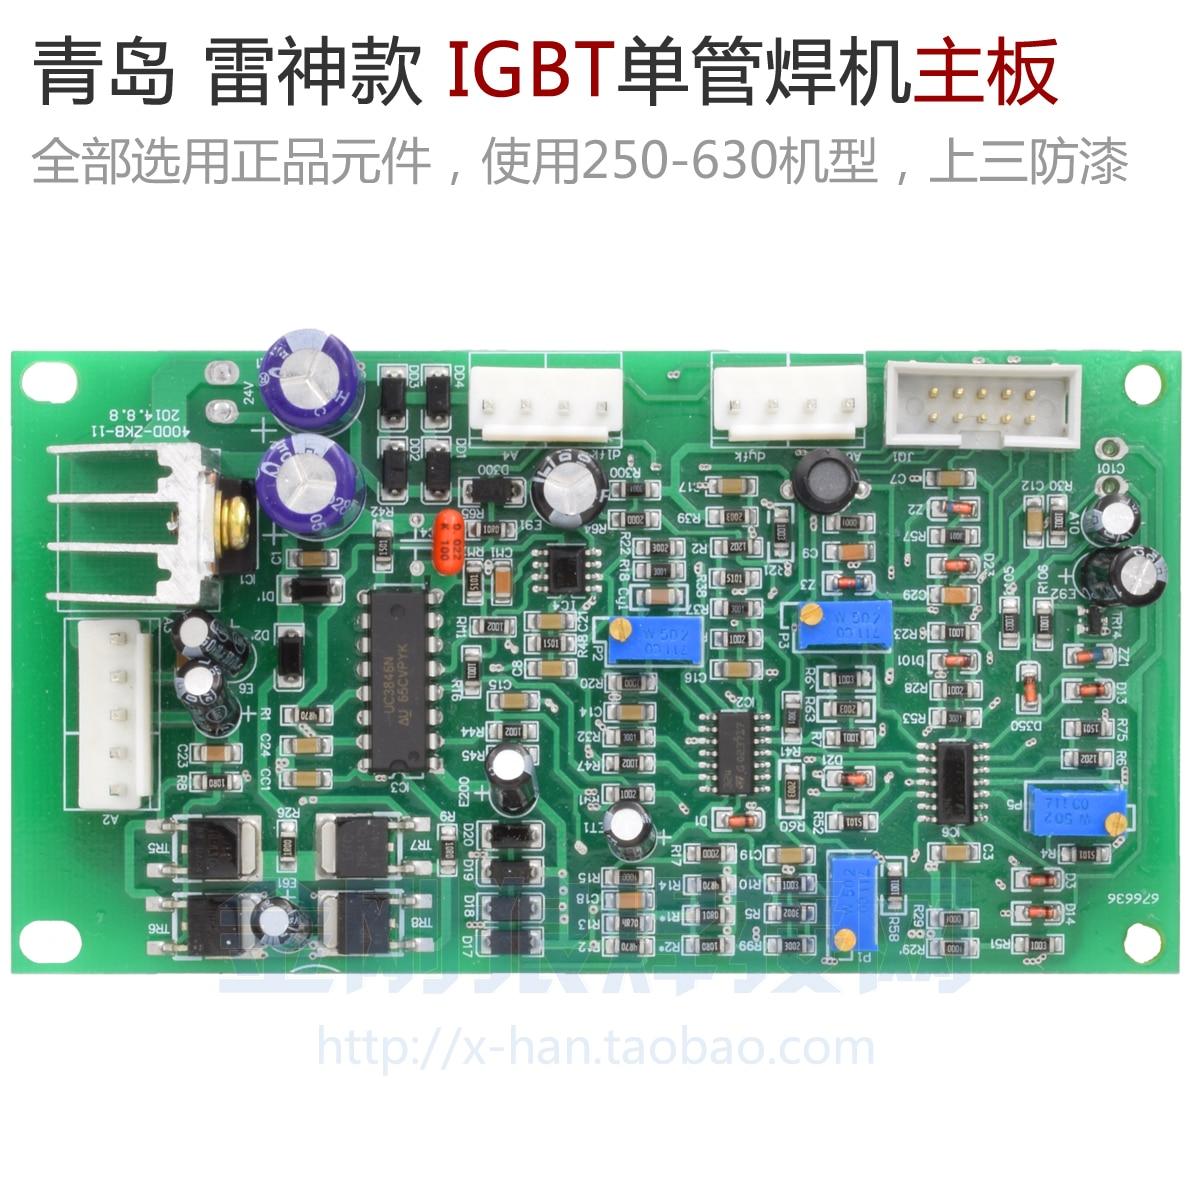 ZX7-400 IGBT Single Tube Inverter WelderZX7-400 IGBT Single Tube Inverter Welder